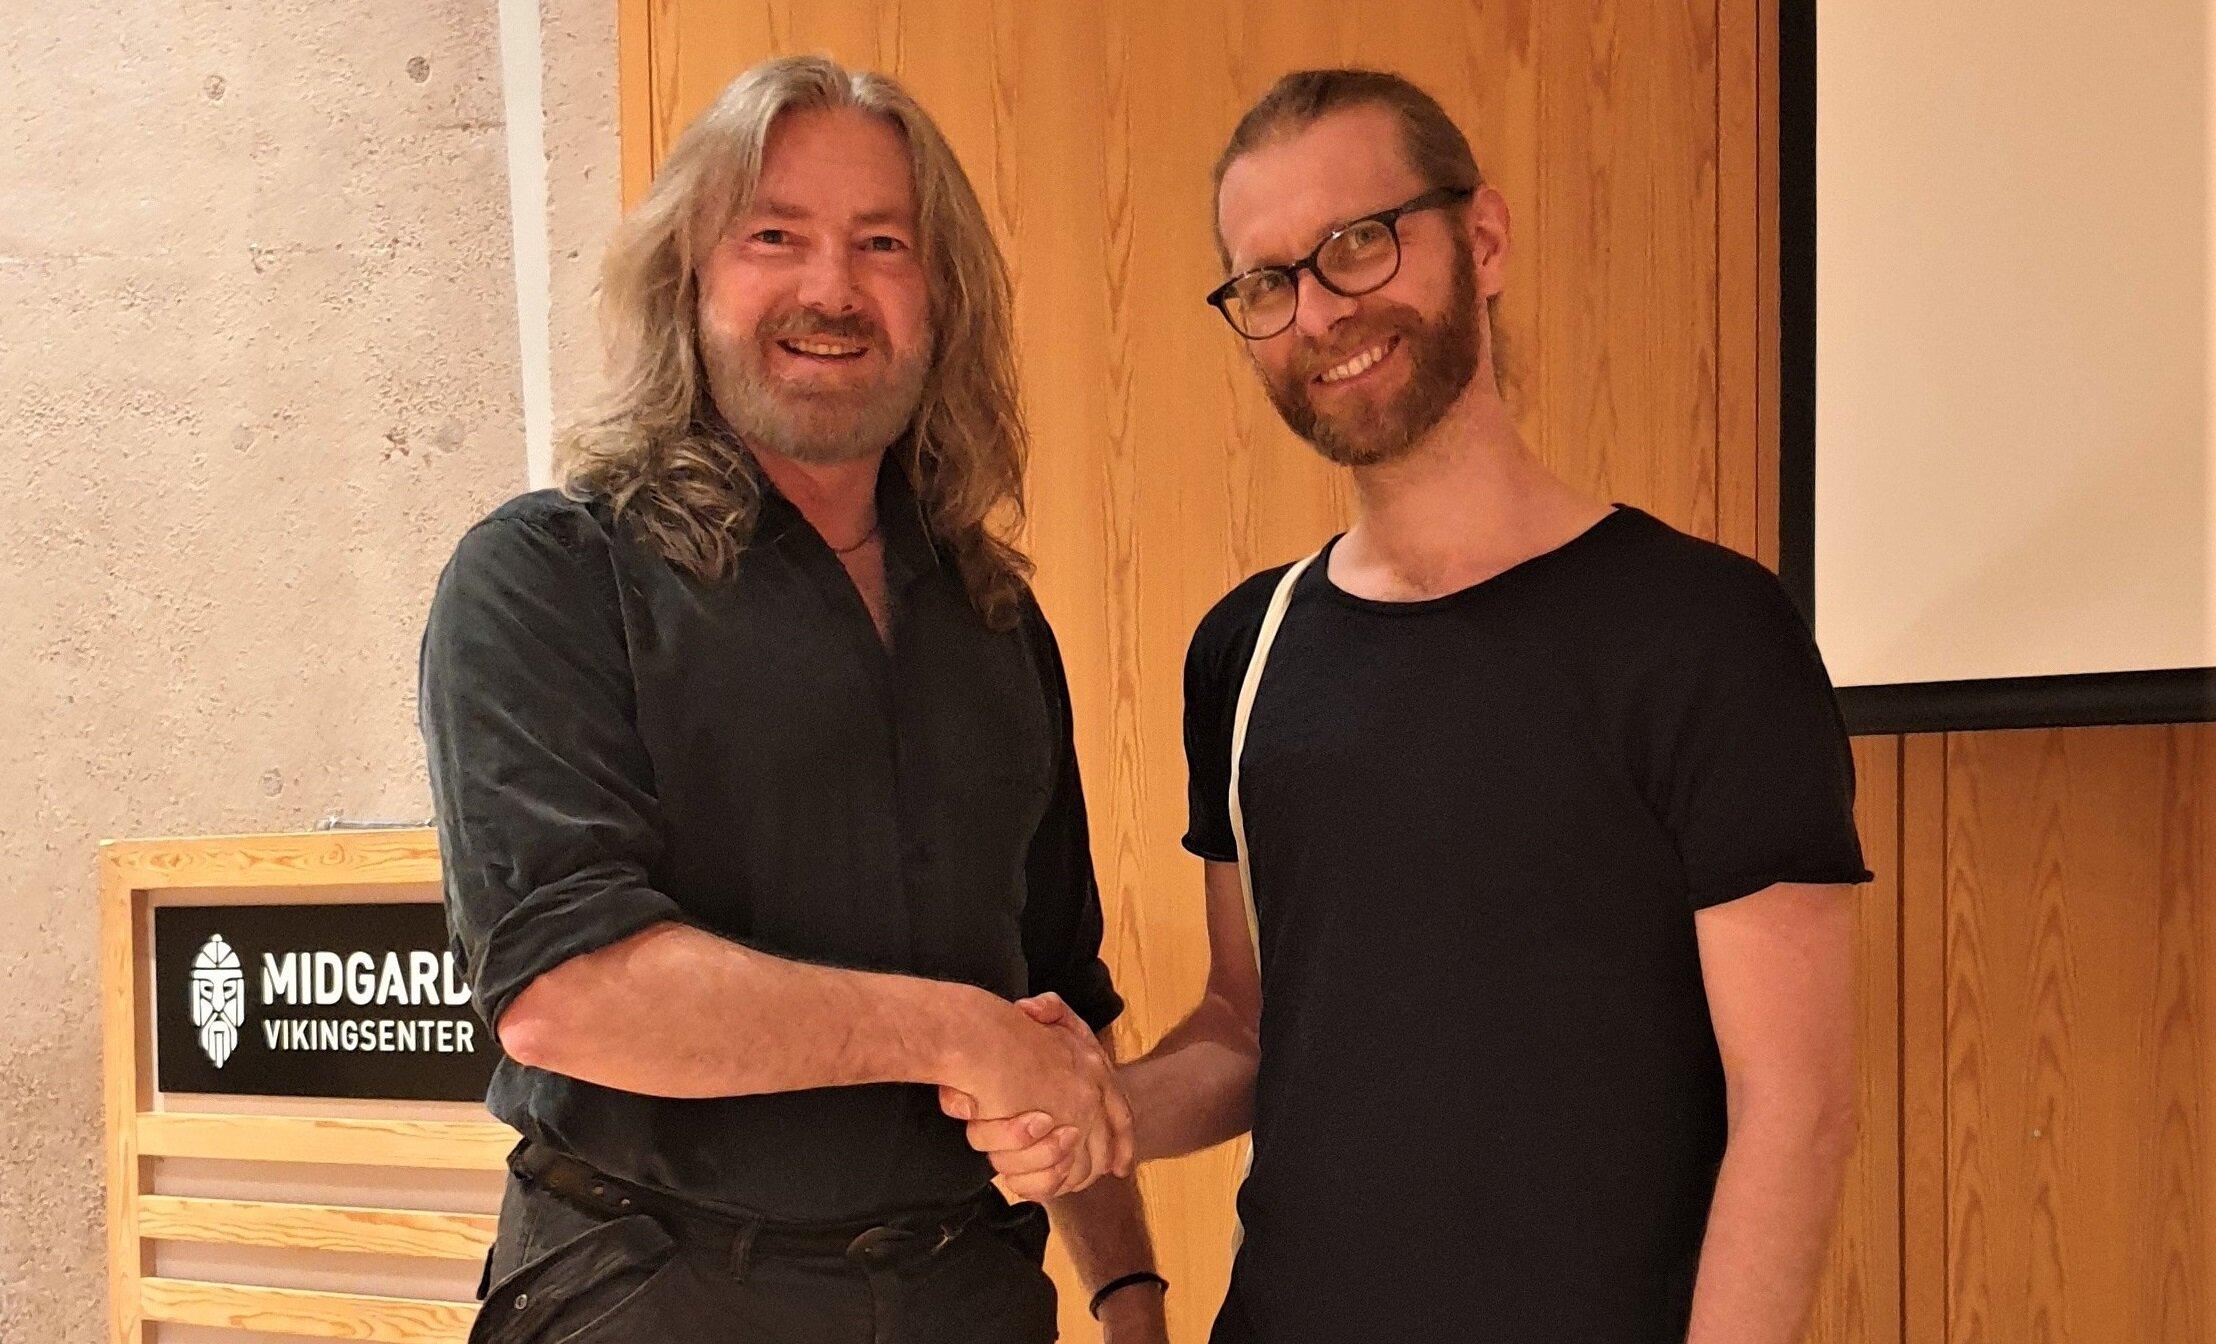 Tyr Neilsen with Vegard Vike at his lecture on Norwegian Viking Swords